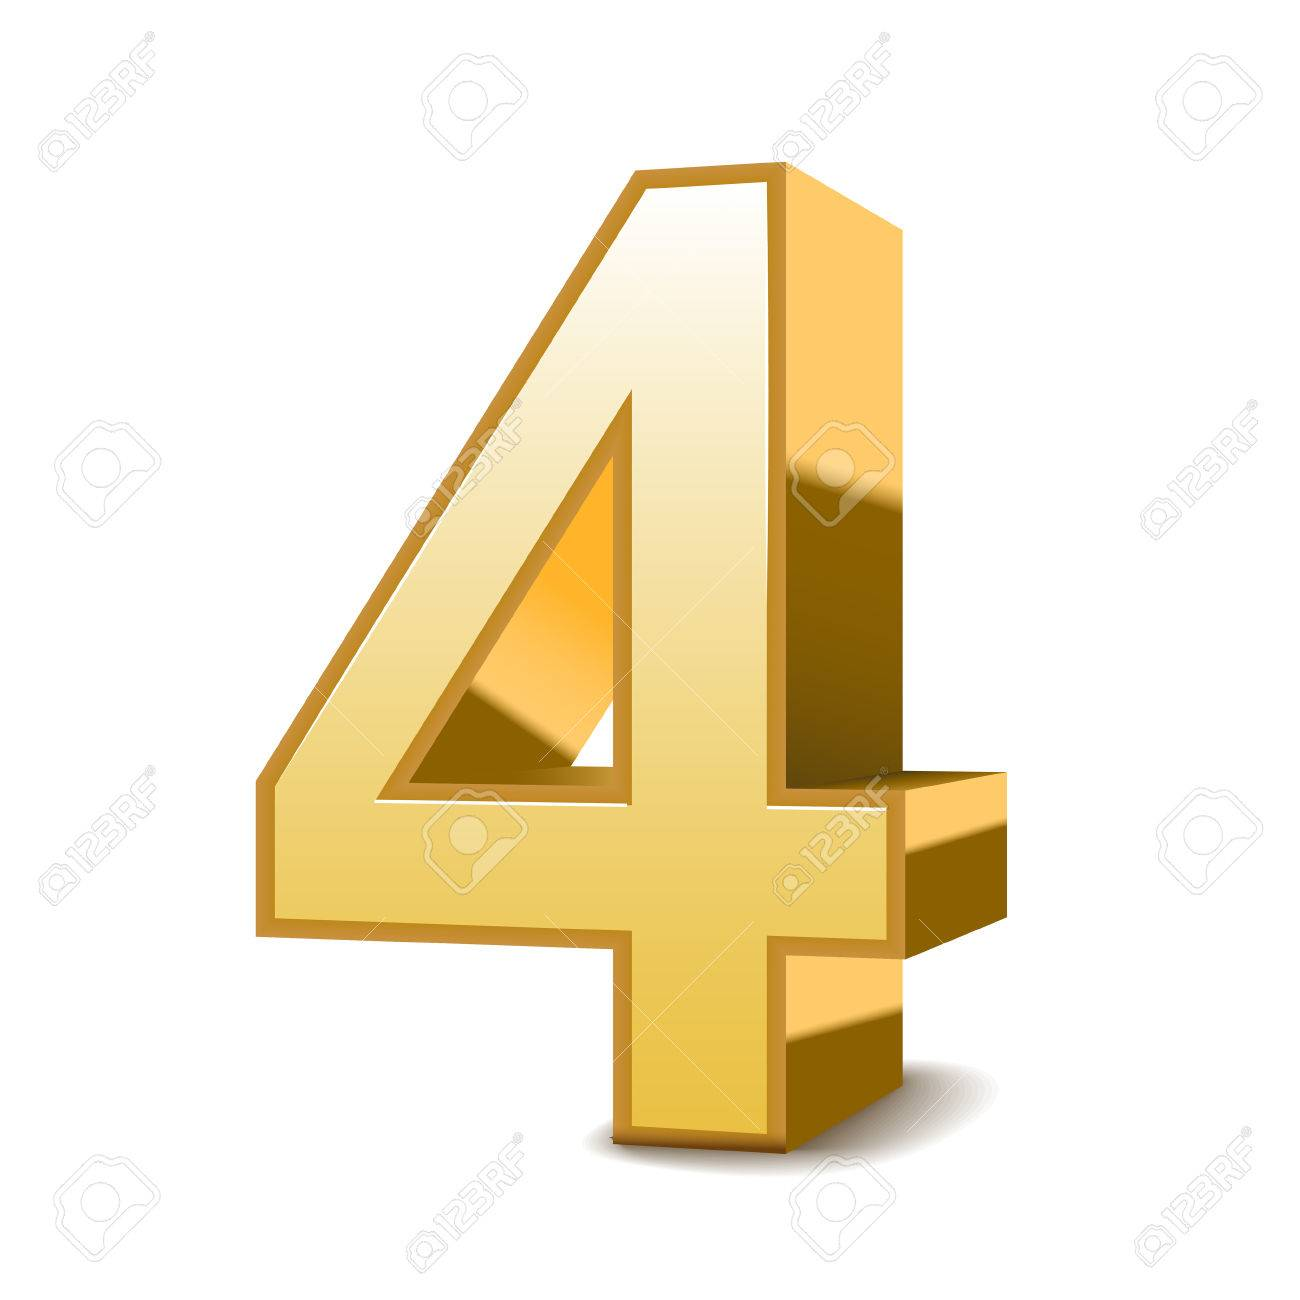 3 D 光沢のある黄金の数 4 白い背景の上のイラスト素材・ベクタ ...